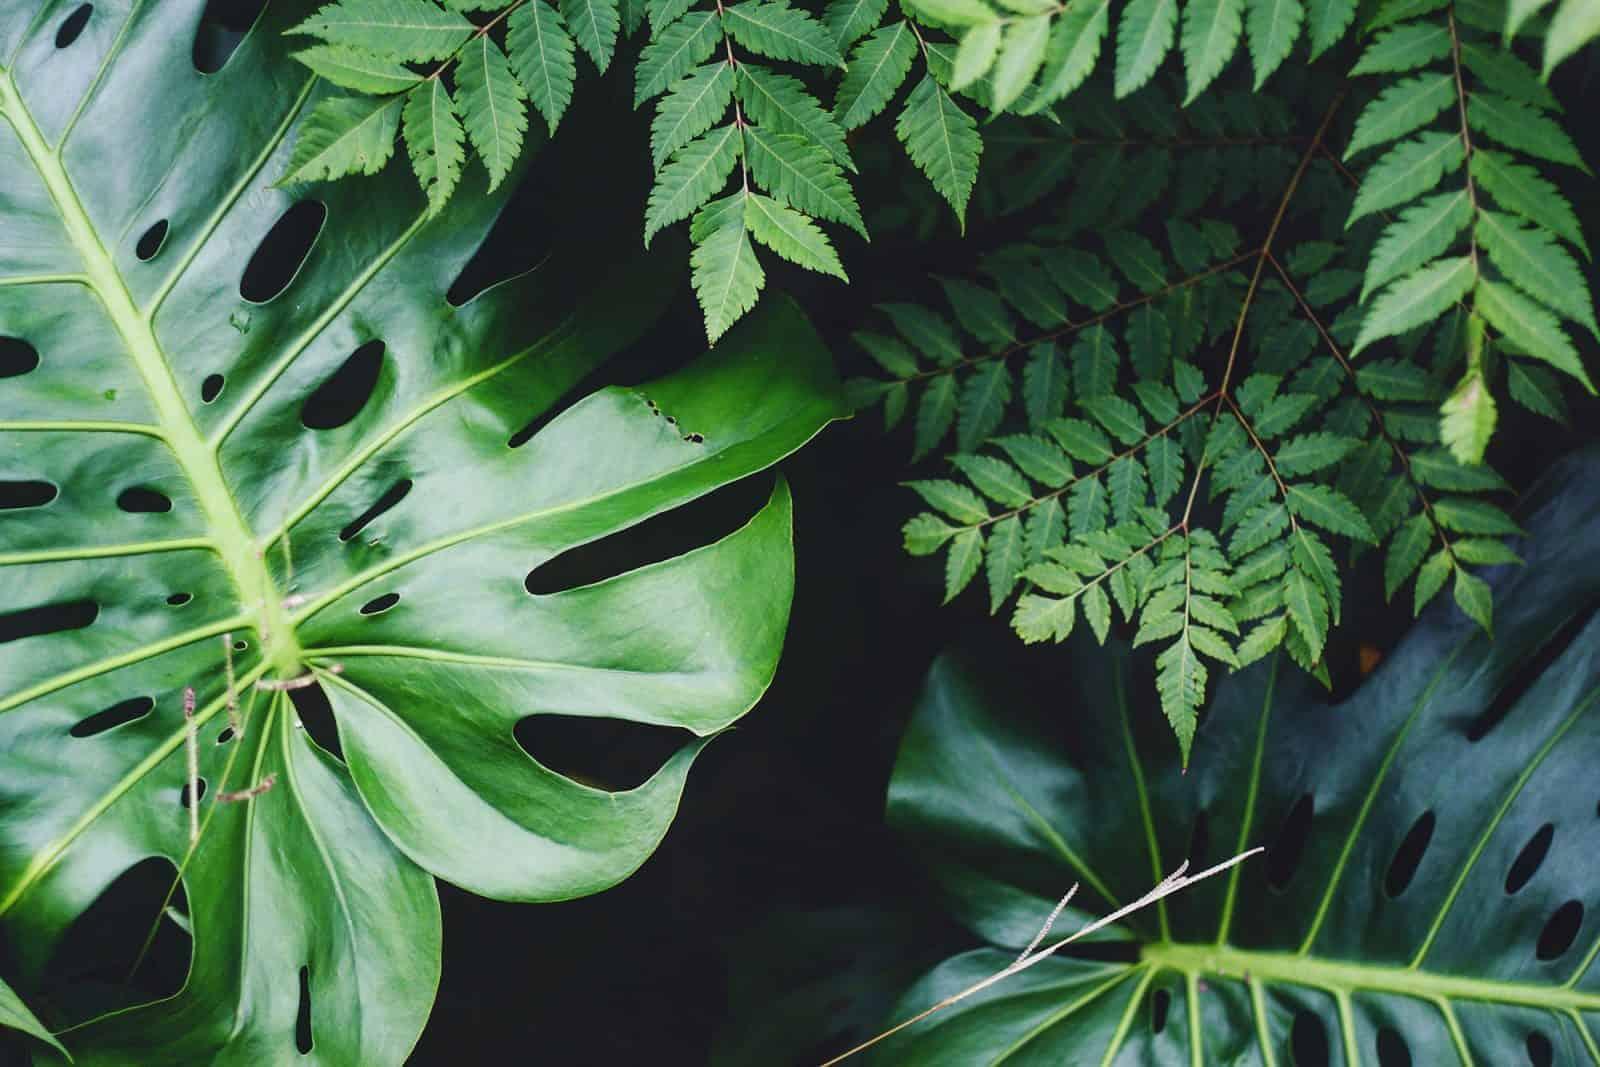 Close up of live green foliage